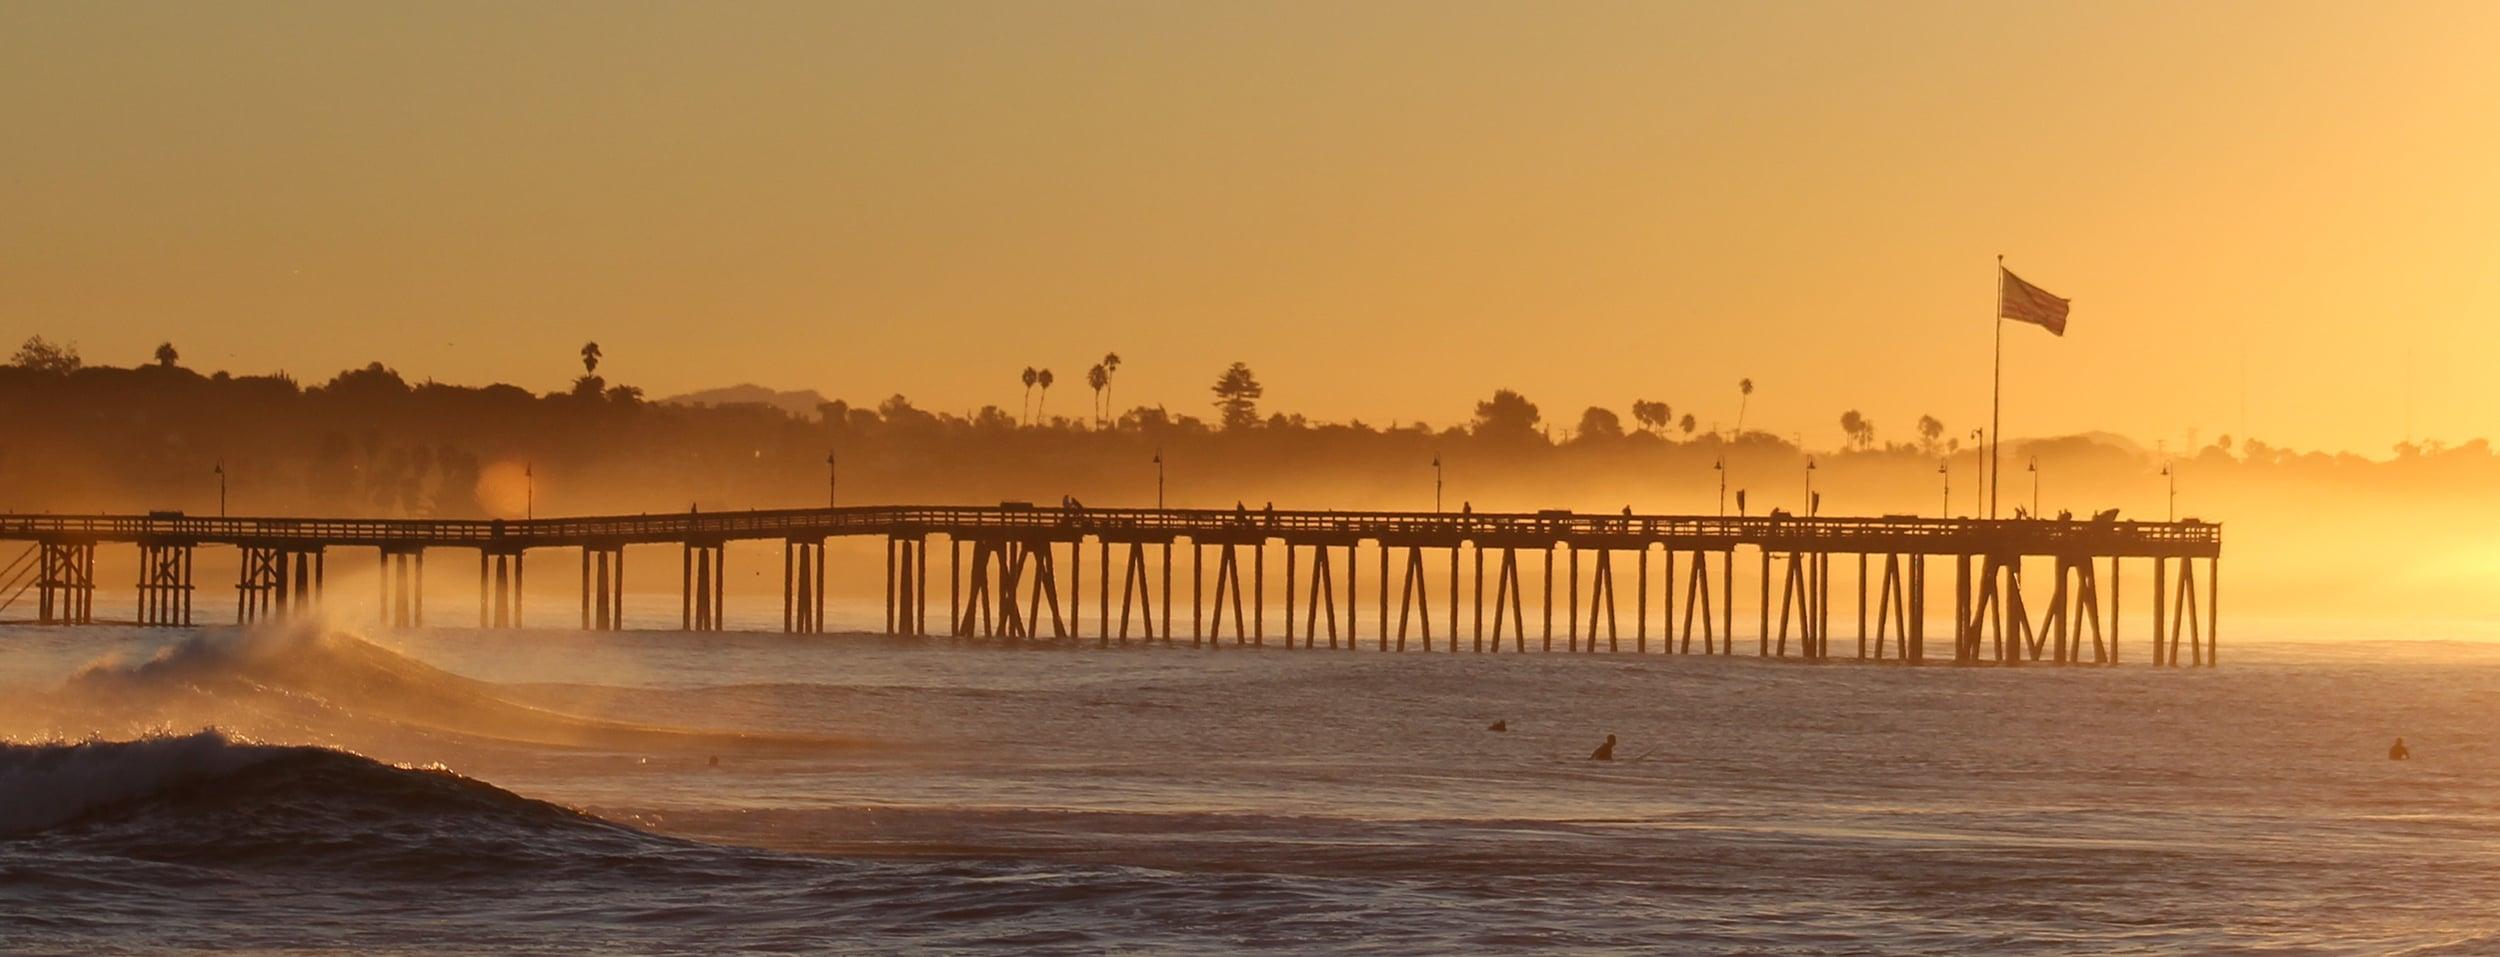 c-street sunrise. photo by desiree east.